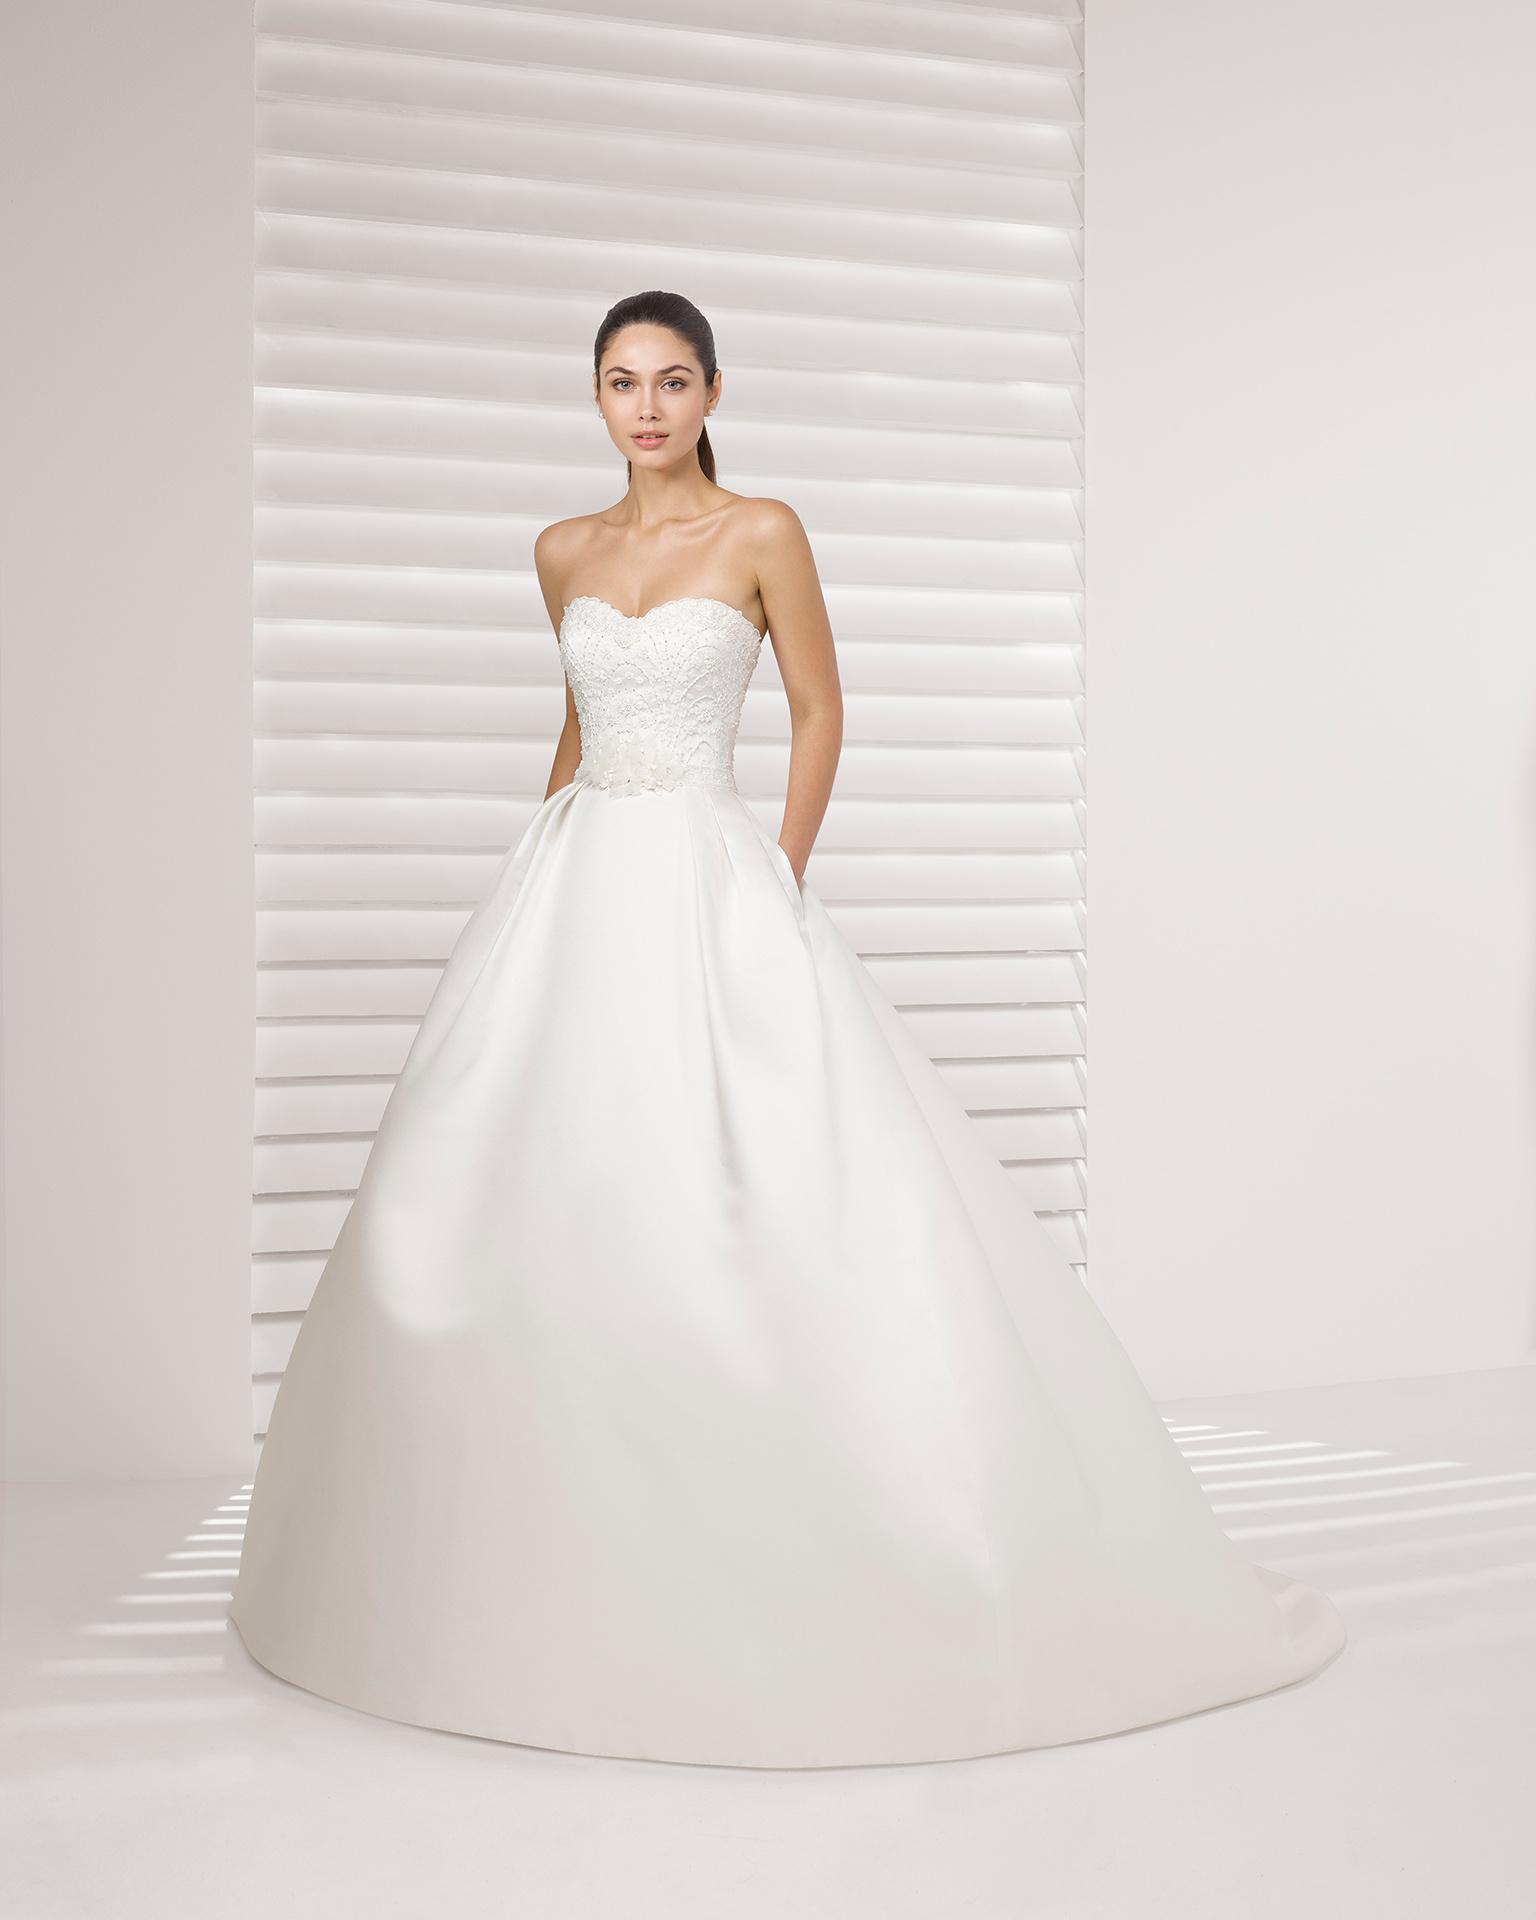 4802a5125a9c China Beading Lace Top with Long Sleeve Bolero Jacket Pocket Satin Wedding  Dress - China Wedding Dress, Dress